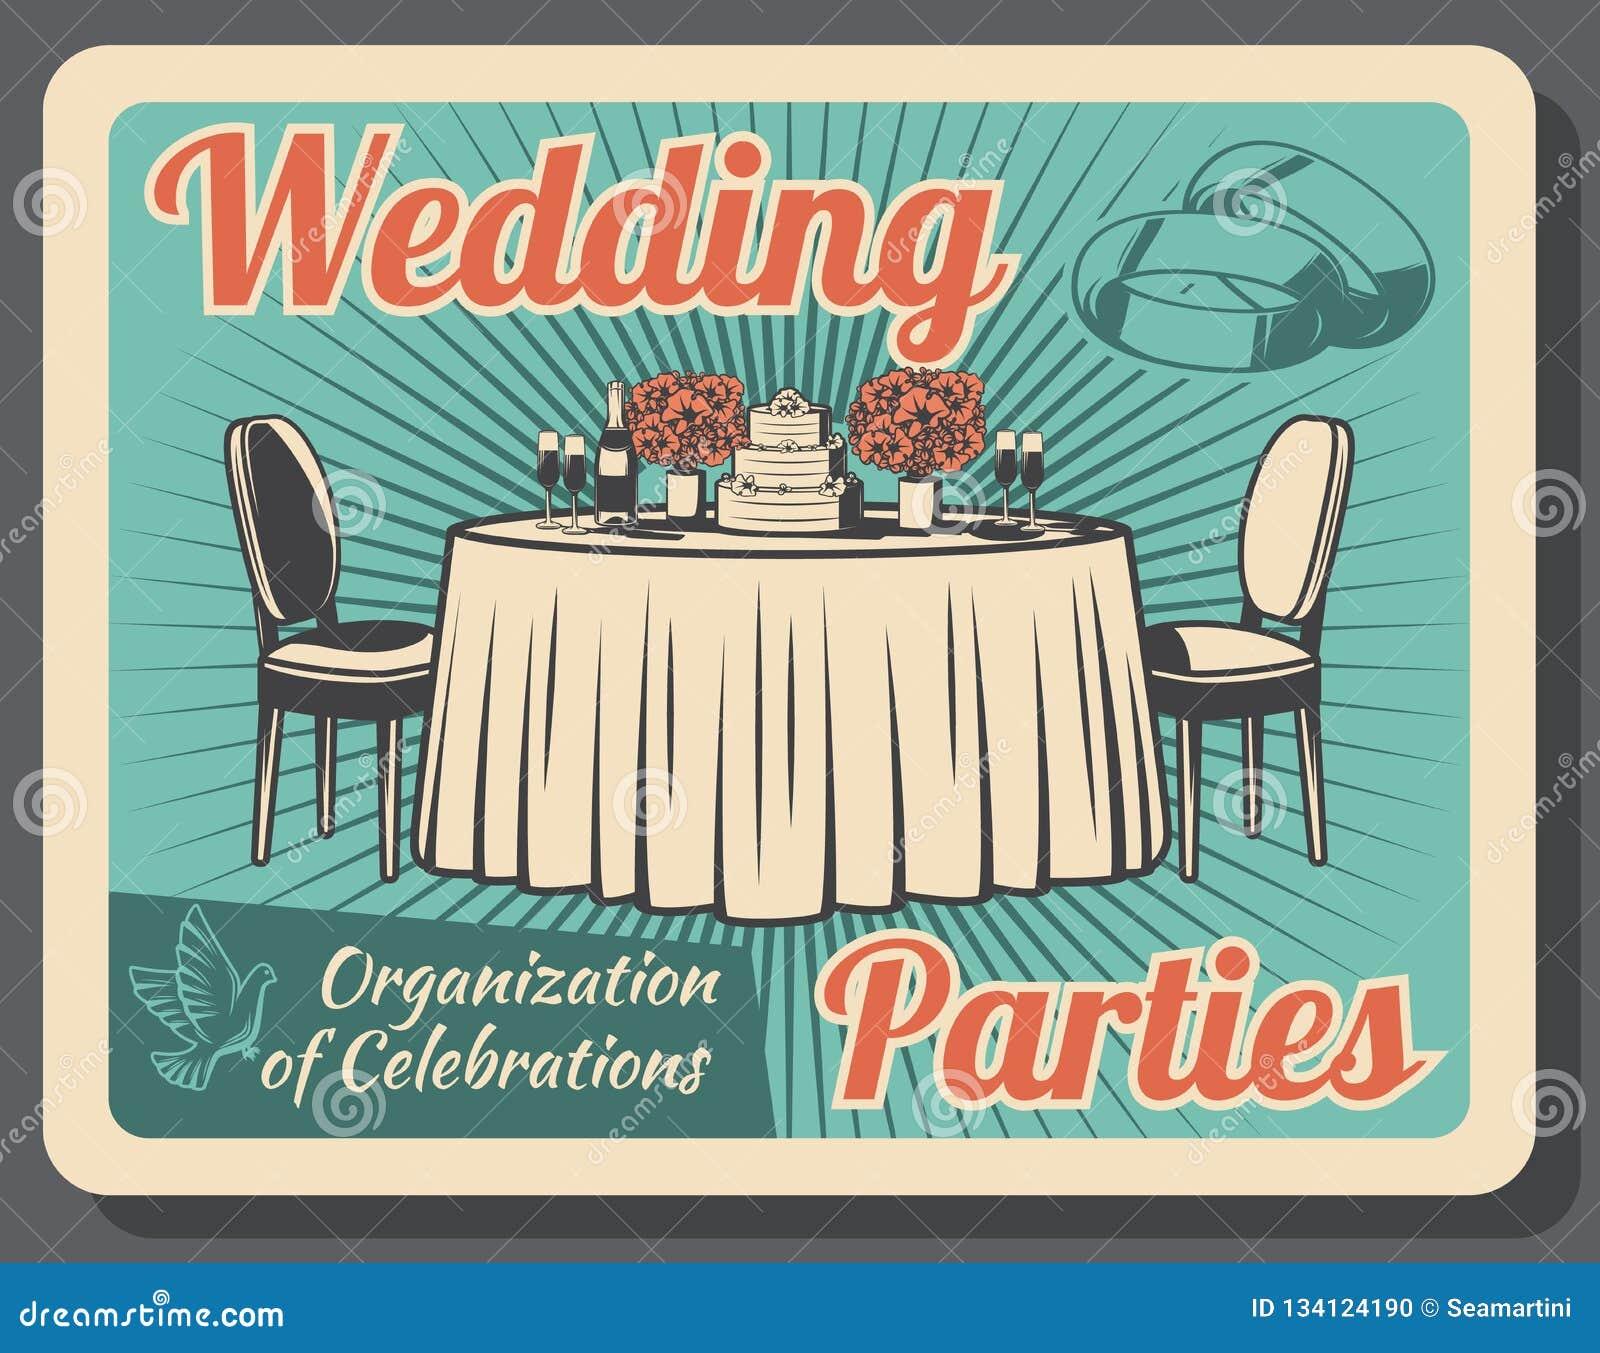 Celebración del matrimonio, organización de banquete de boda